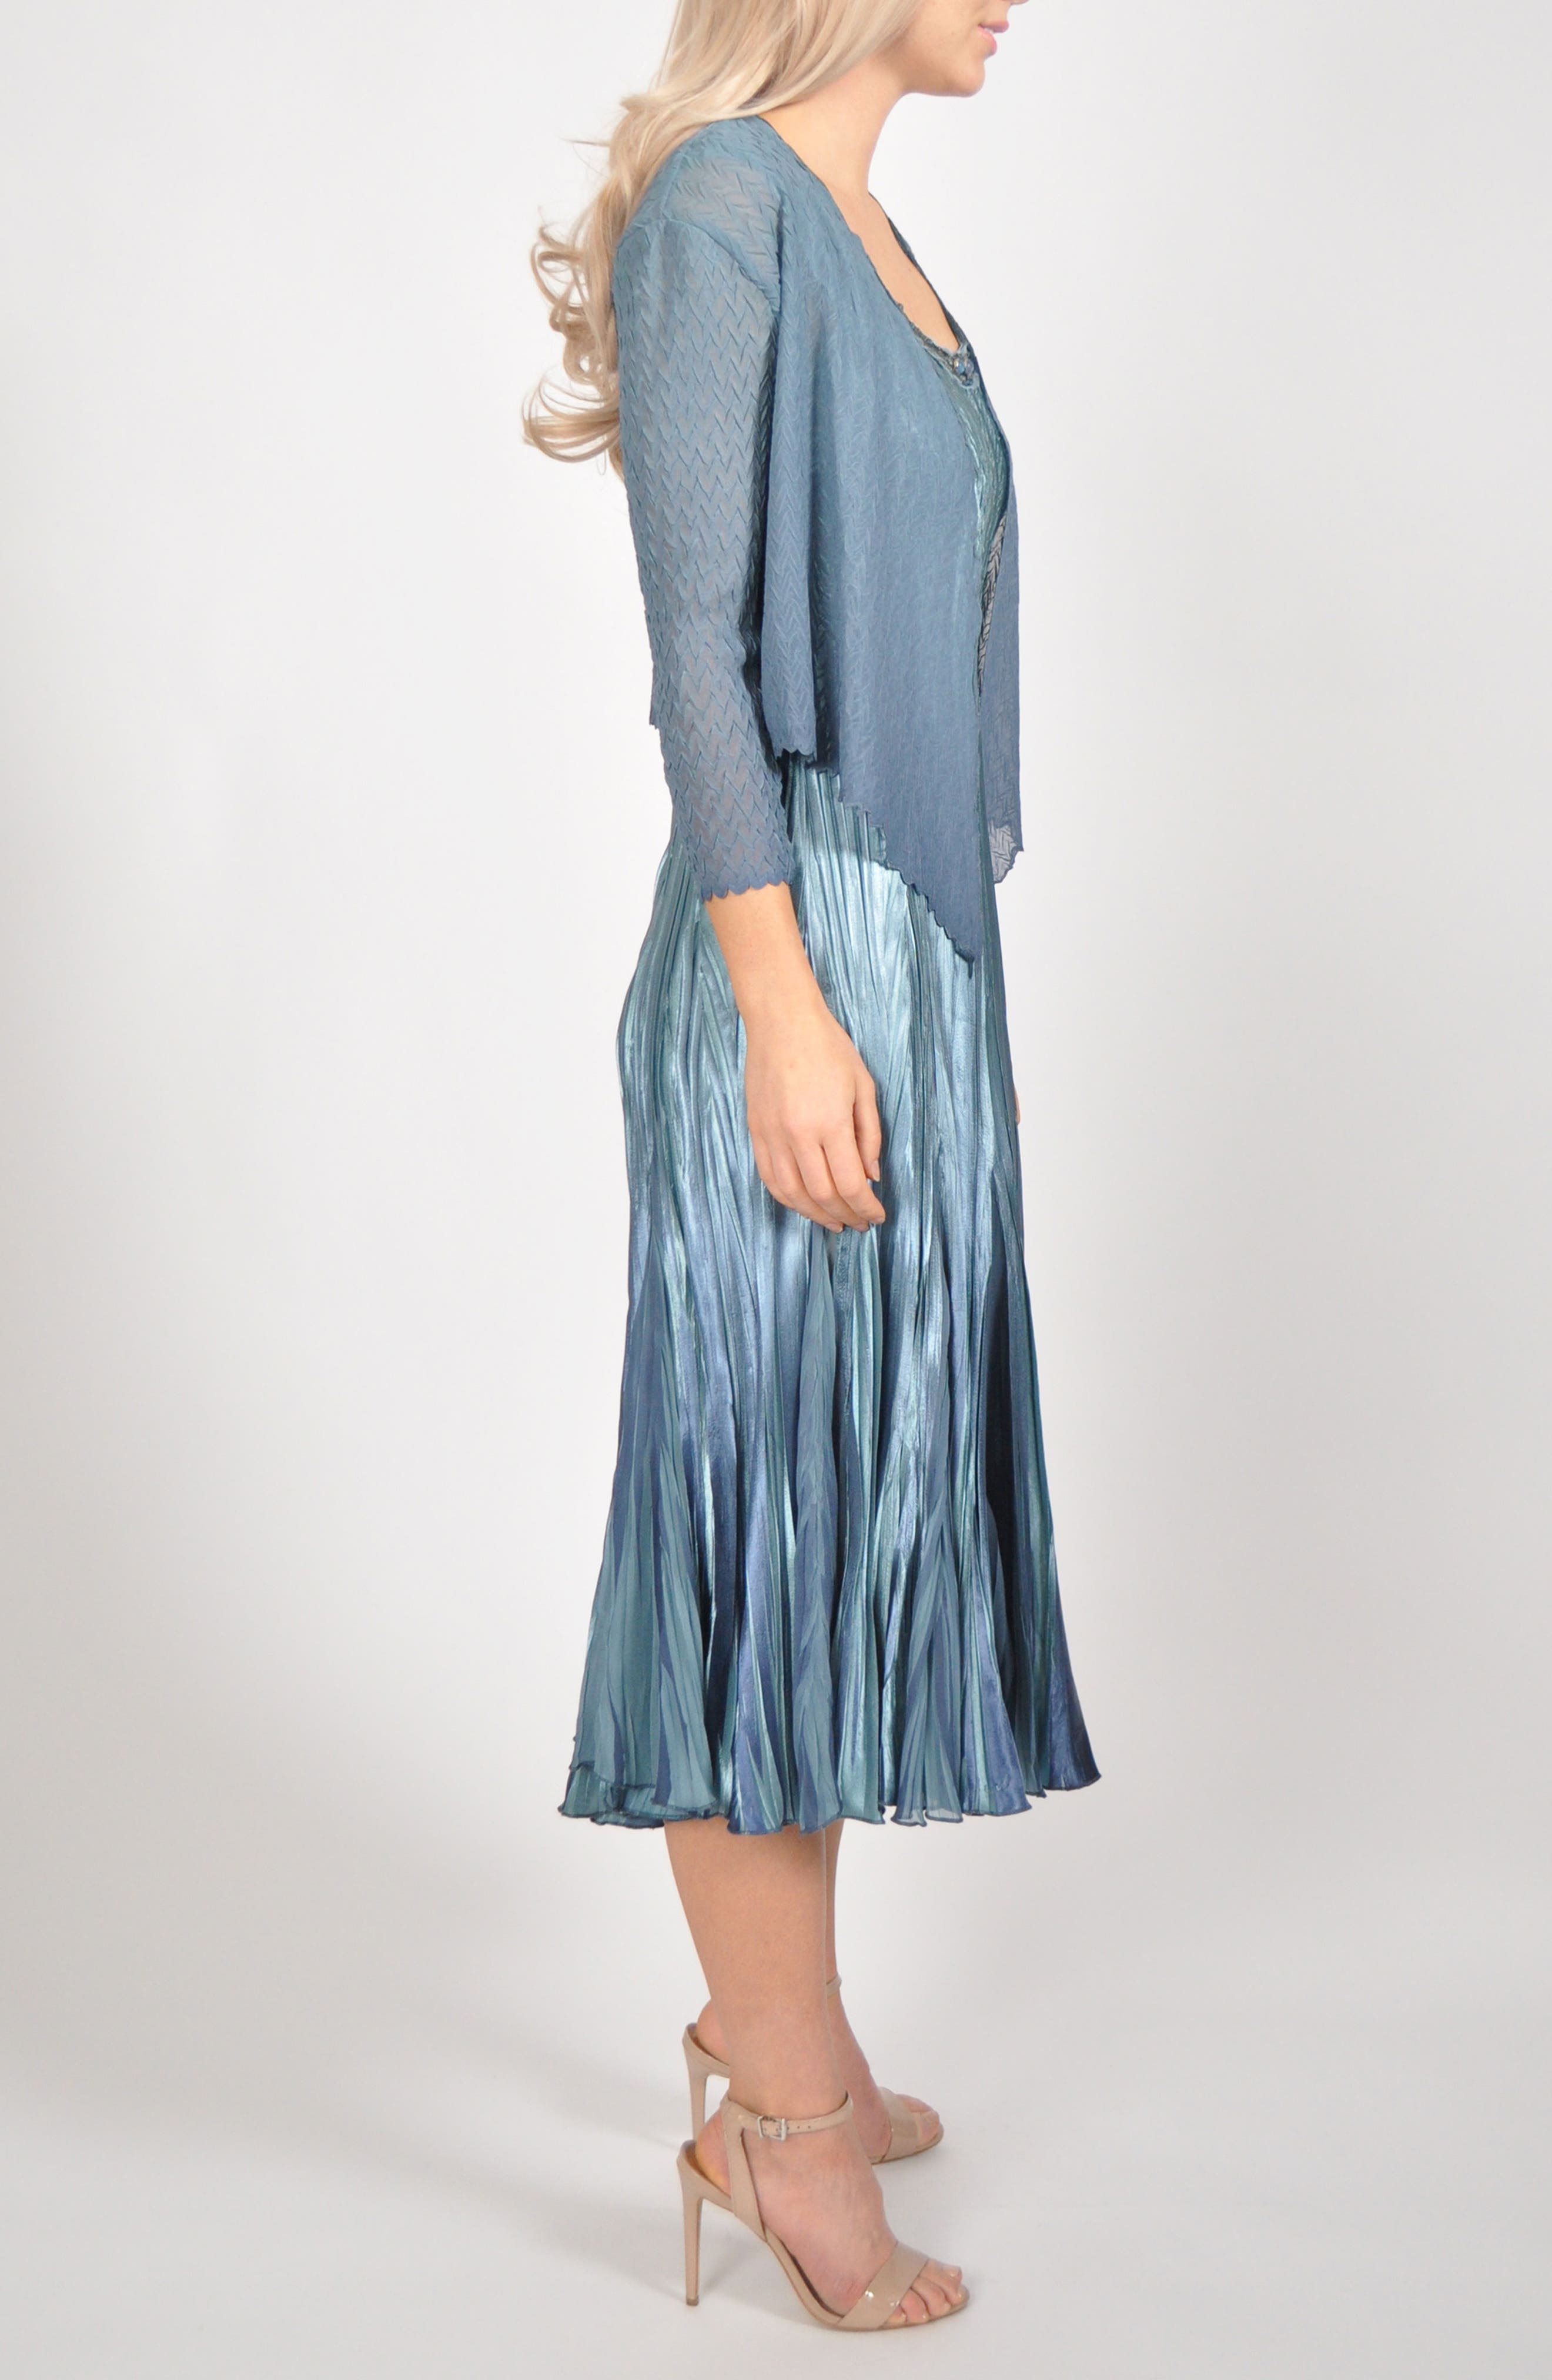 KOMAROV, Embellished Pleat Mixed Media Dress with Jacket, Alternate thumbnail 6, color, 405